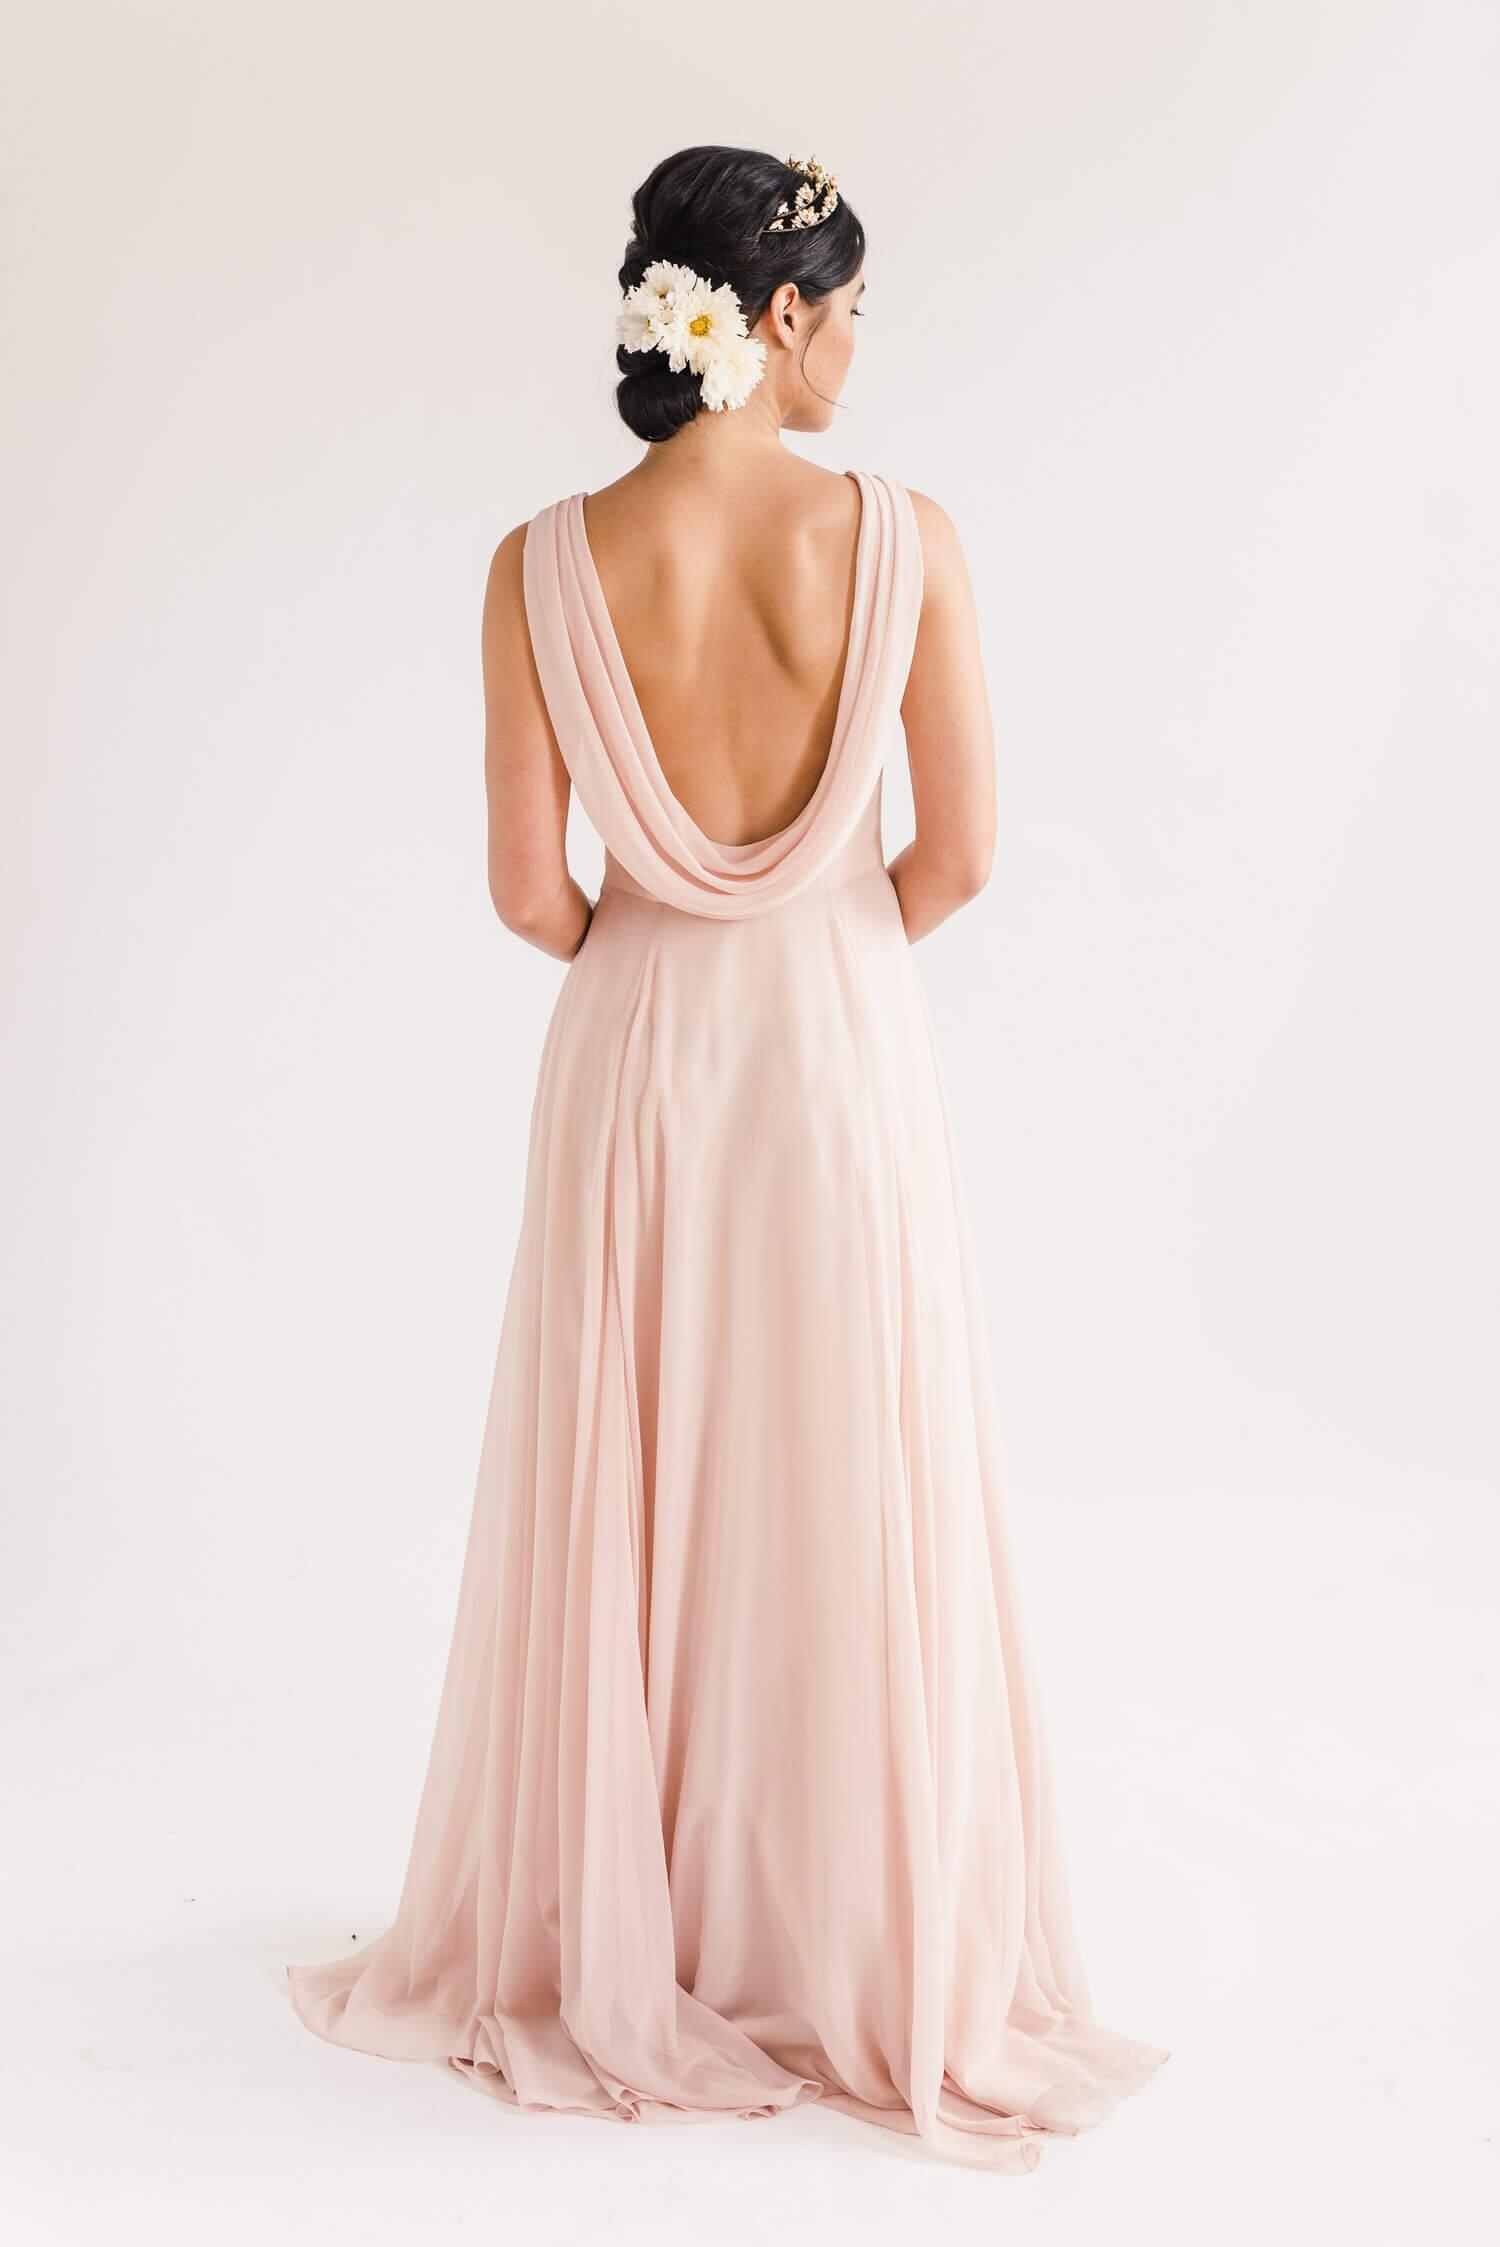 TH&H Athena Bridesmaid Dress Blush